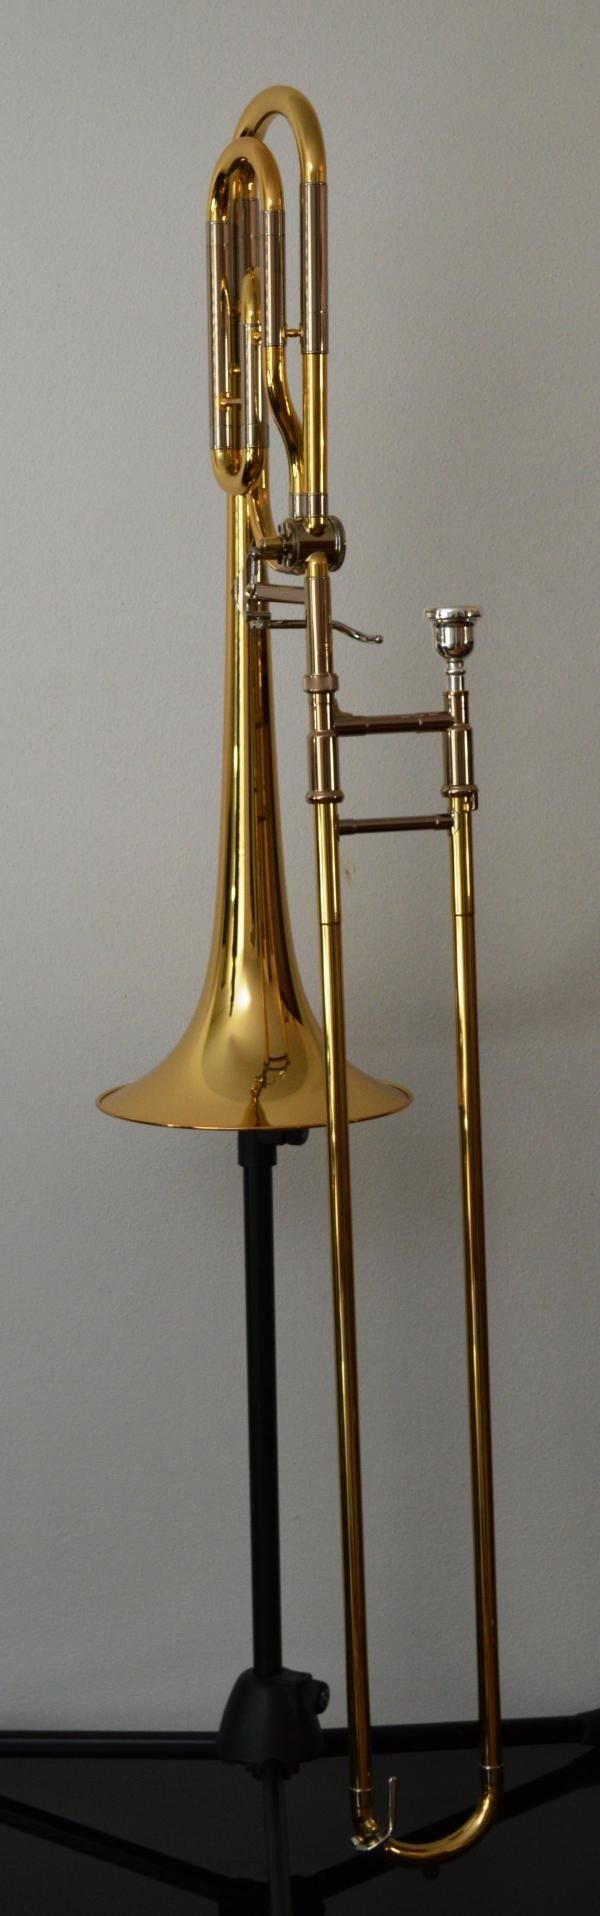 Yamaha YSL-640 Slide Trombone